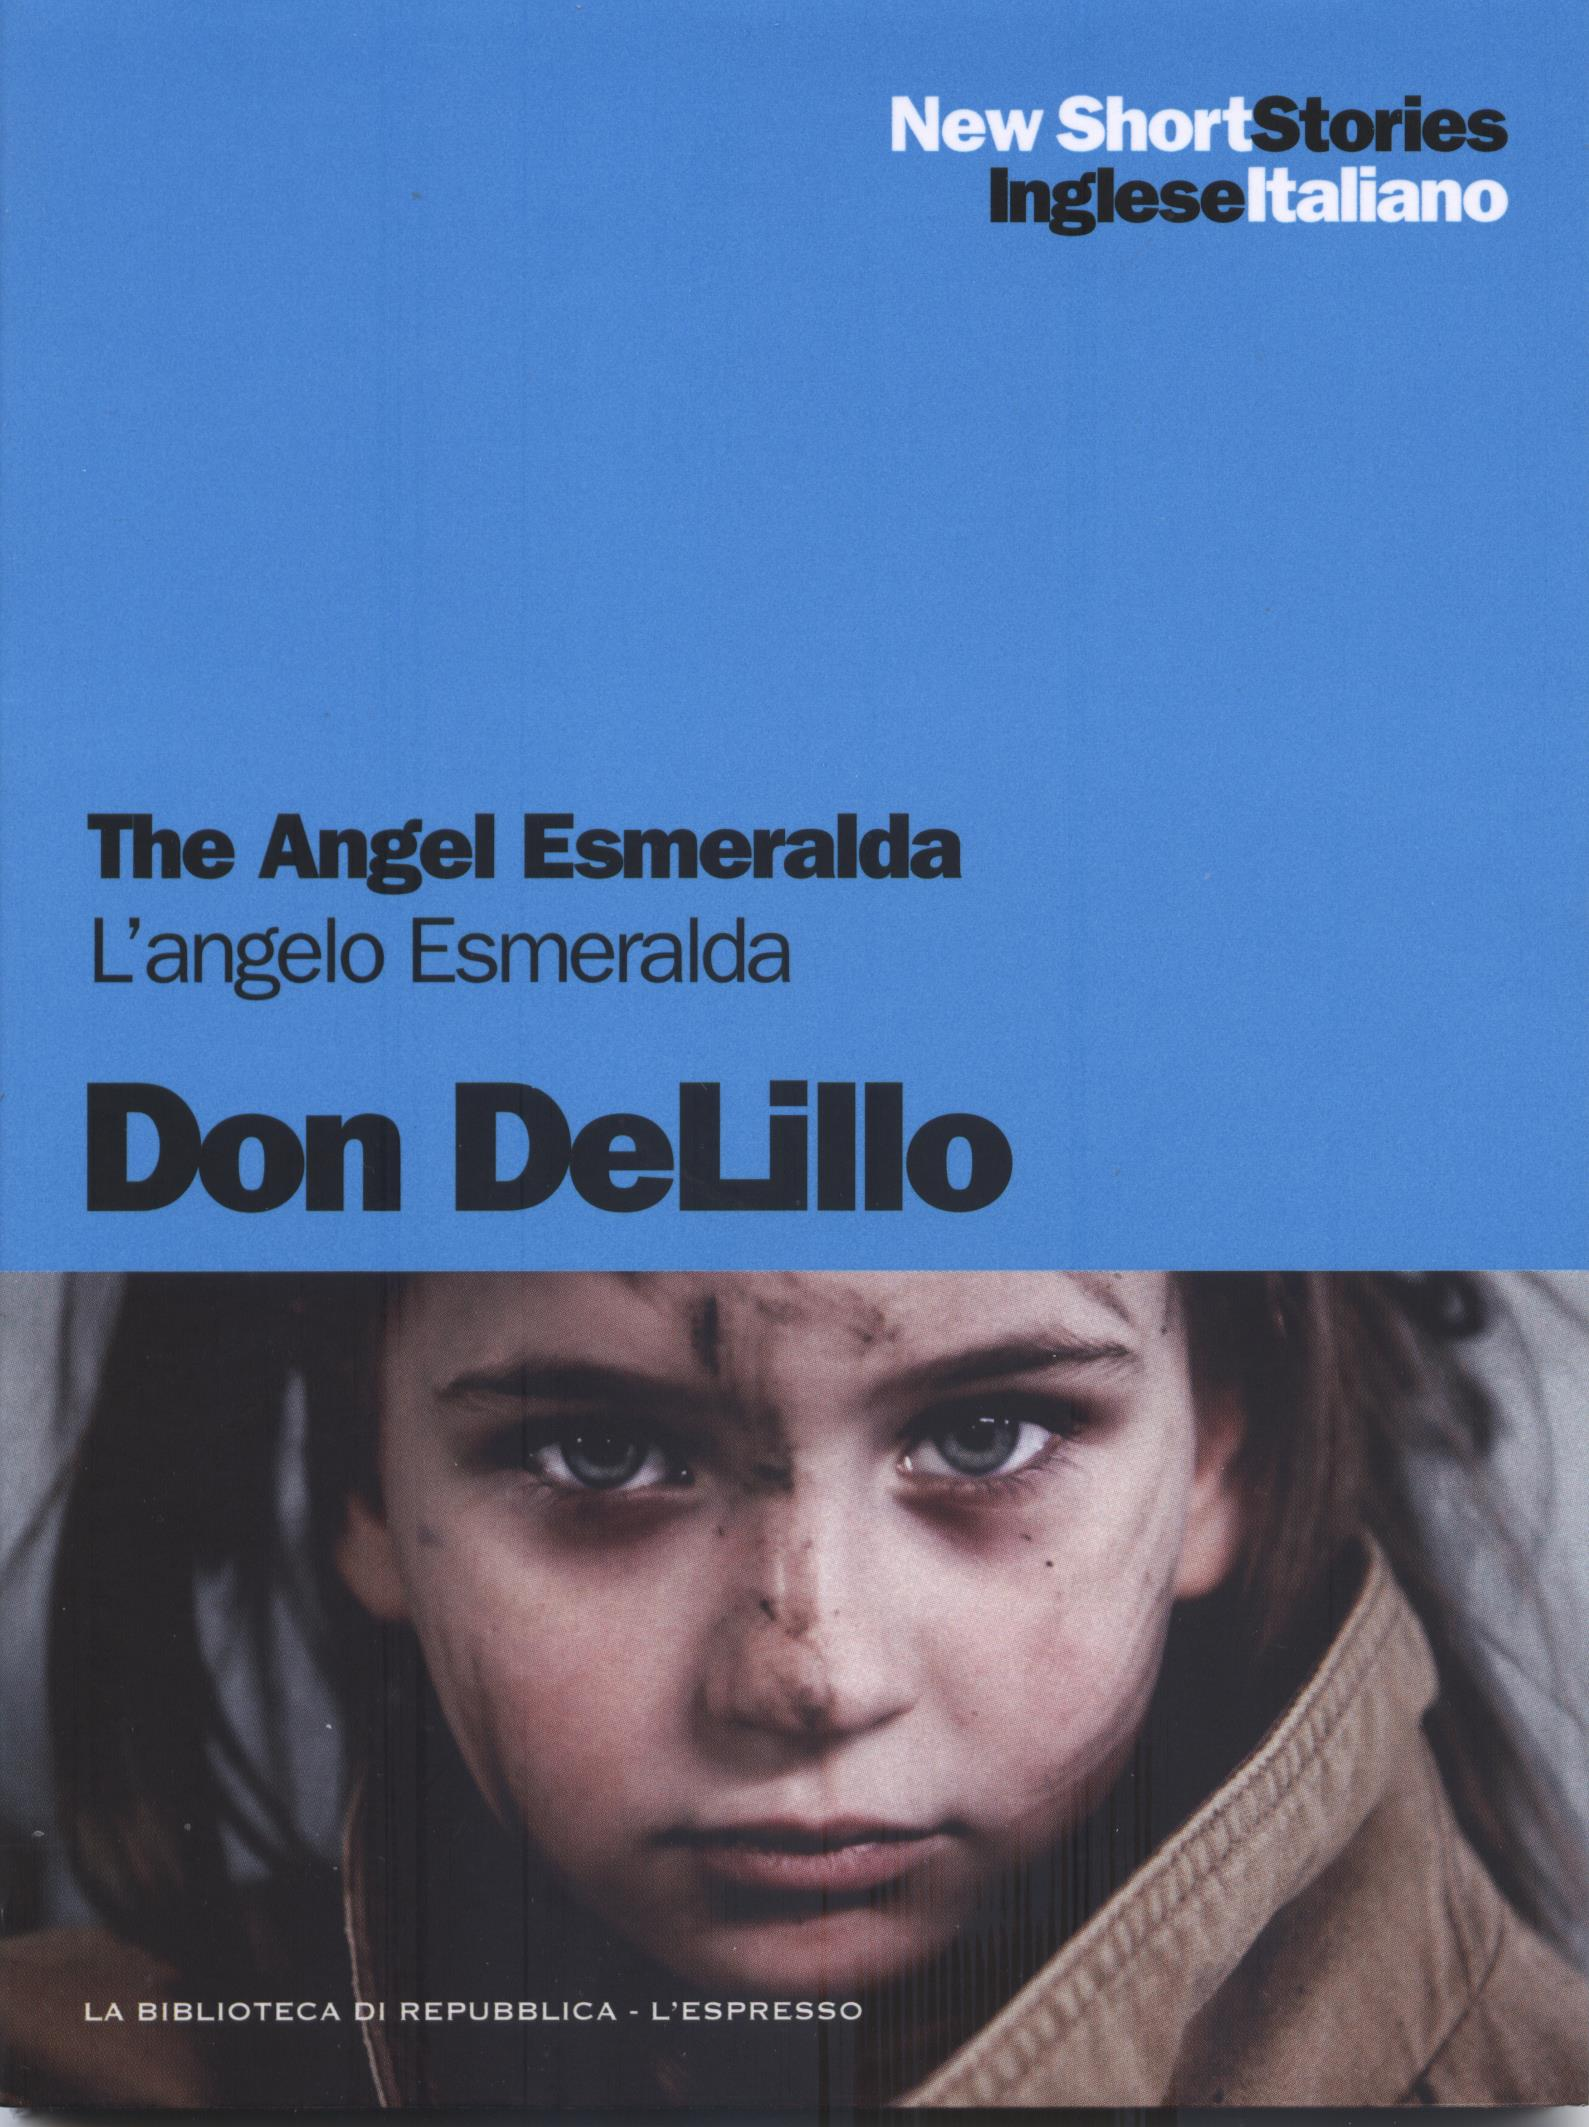 The angel Esmeralda ...